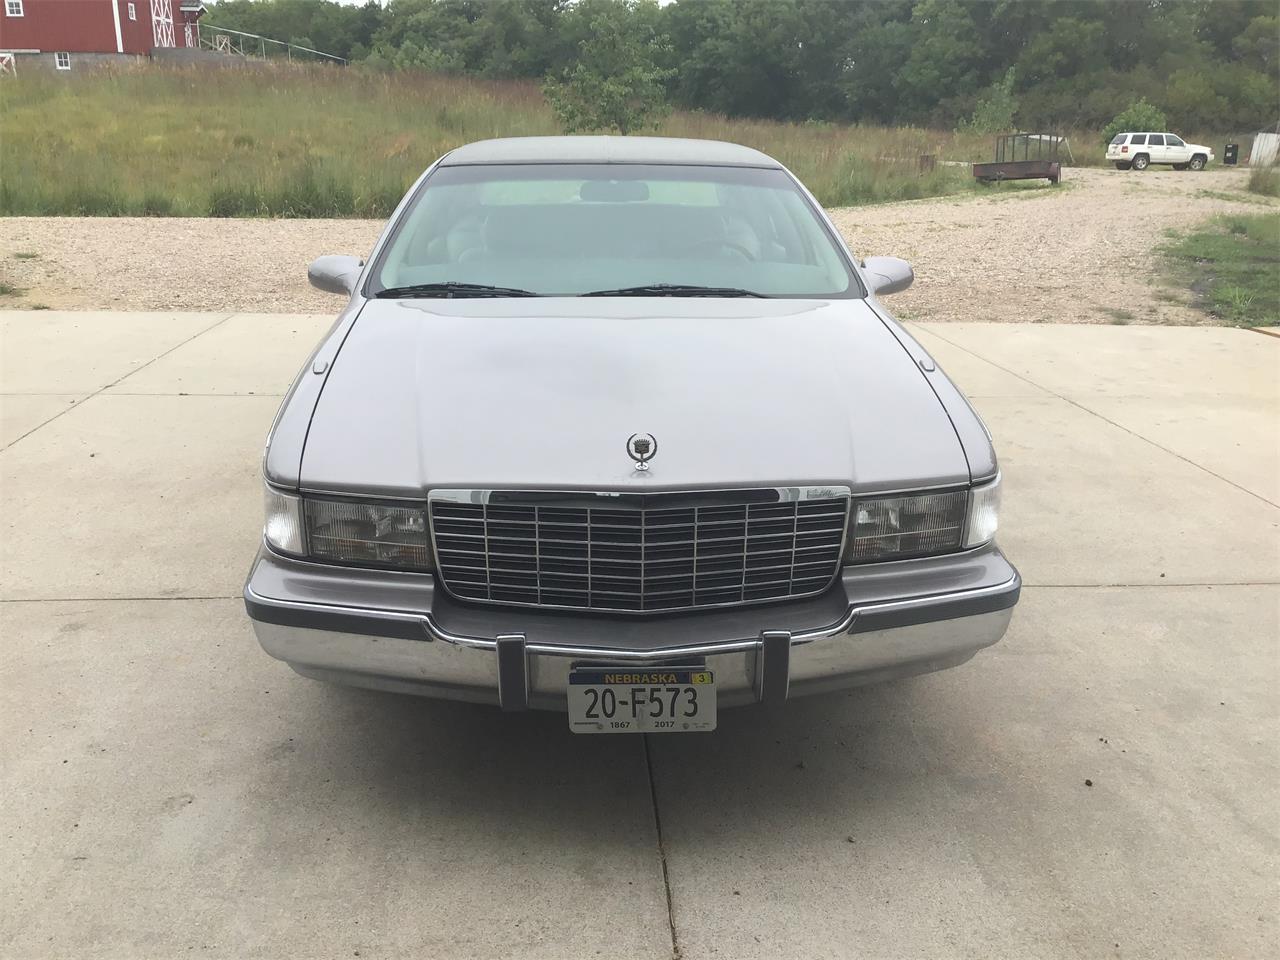 1996 Cadillac Fleetwood Brougham (CC-1389038) for sale in Alvo, Nebraska